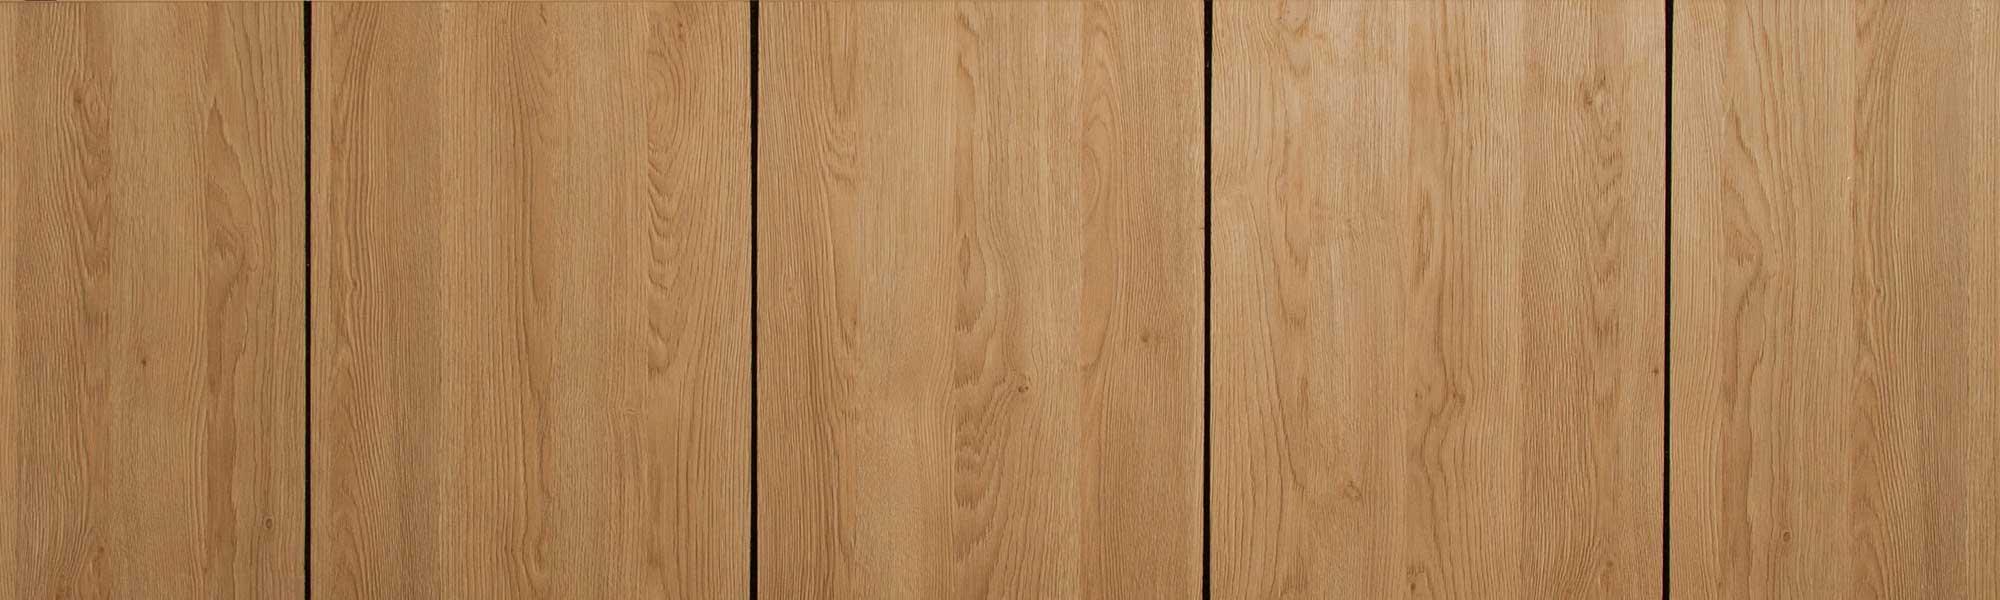 Morland Panels